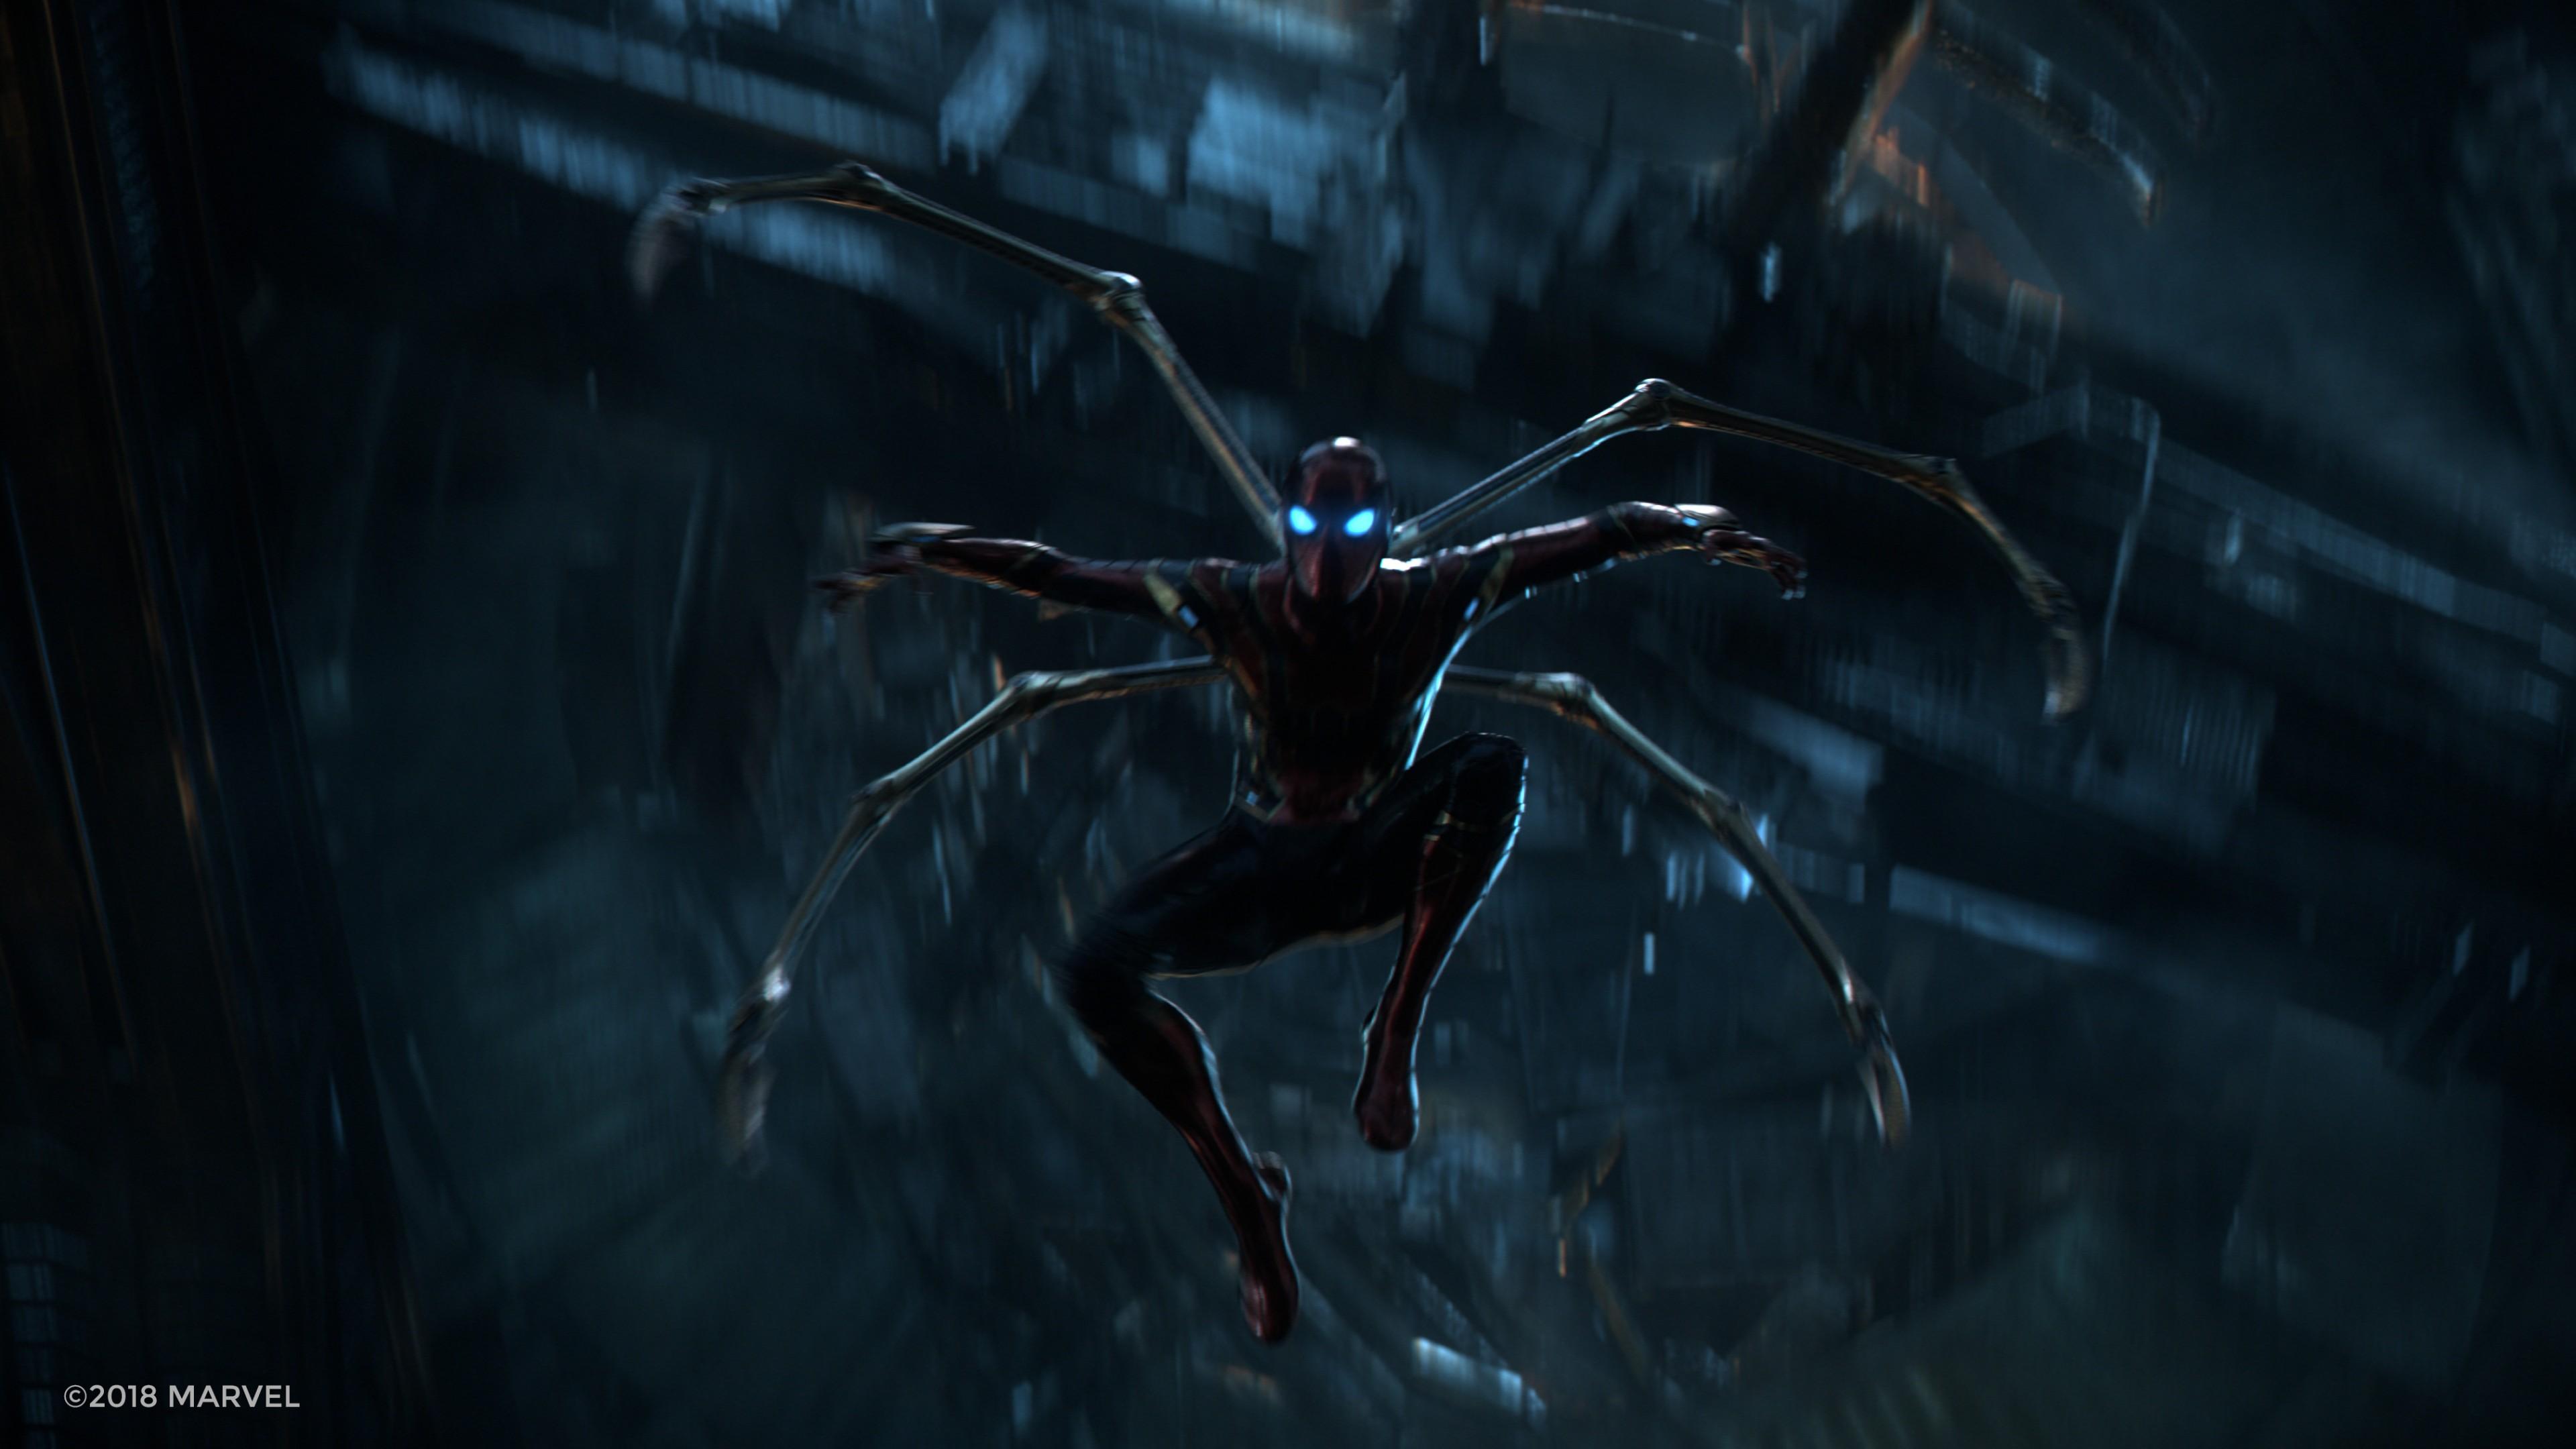 wallpaper avengers infinity war iron spider 4k movies